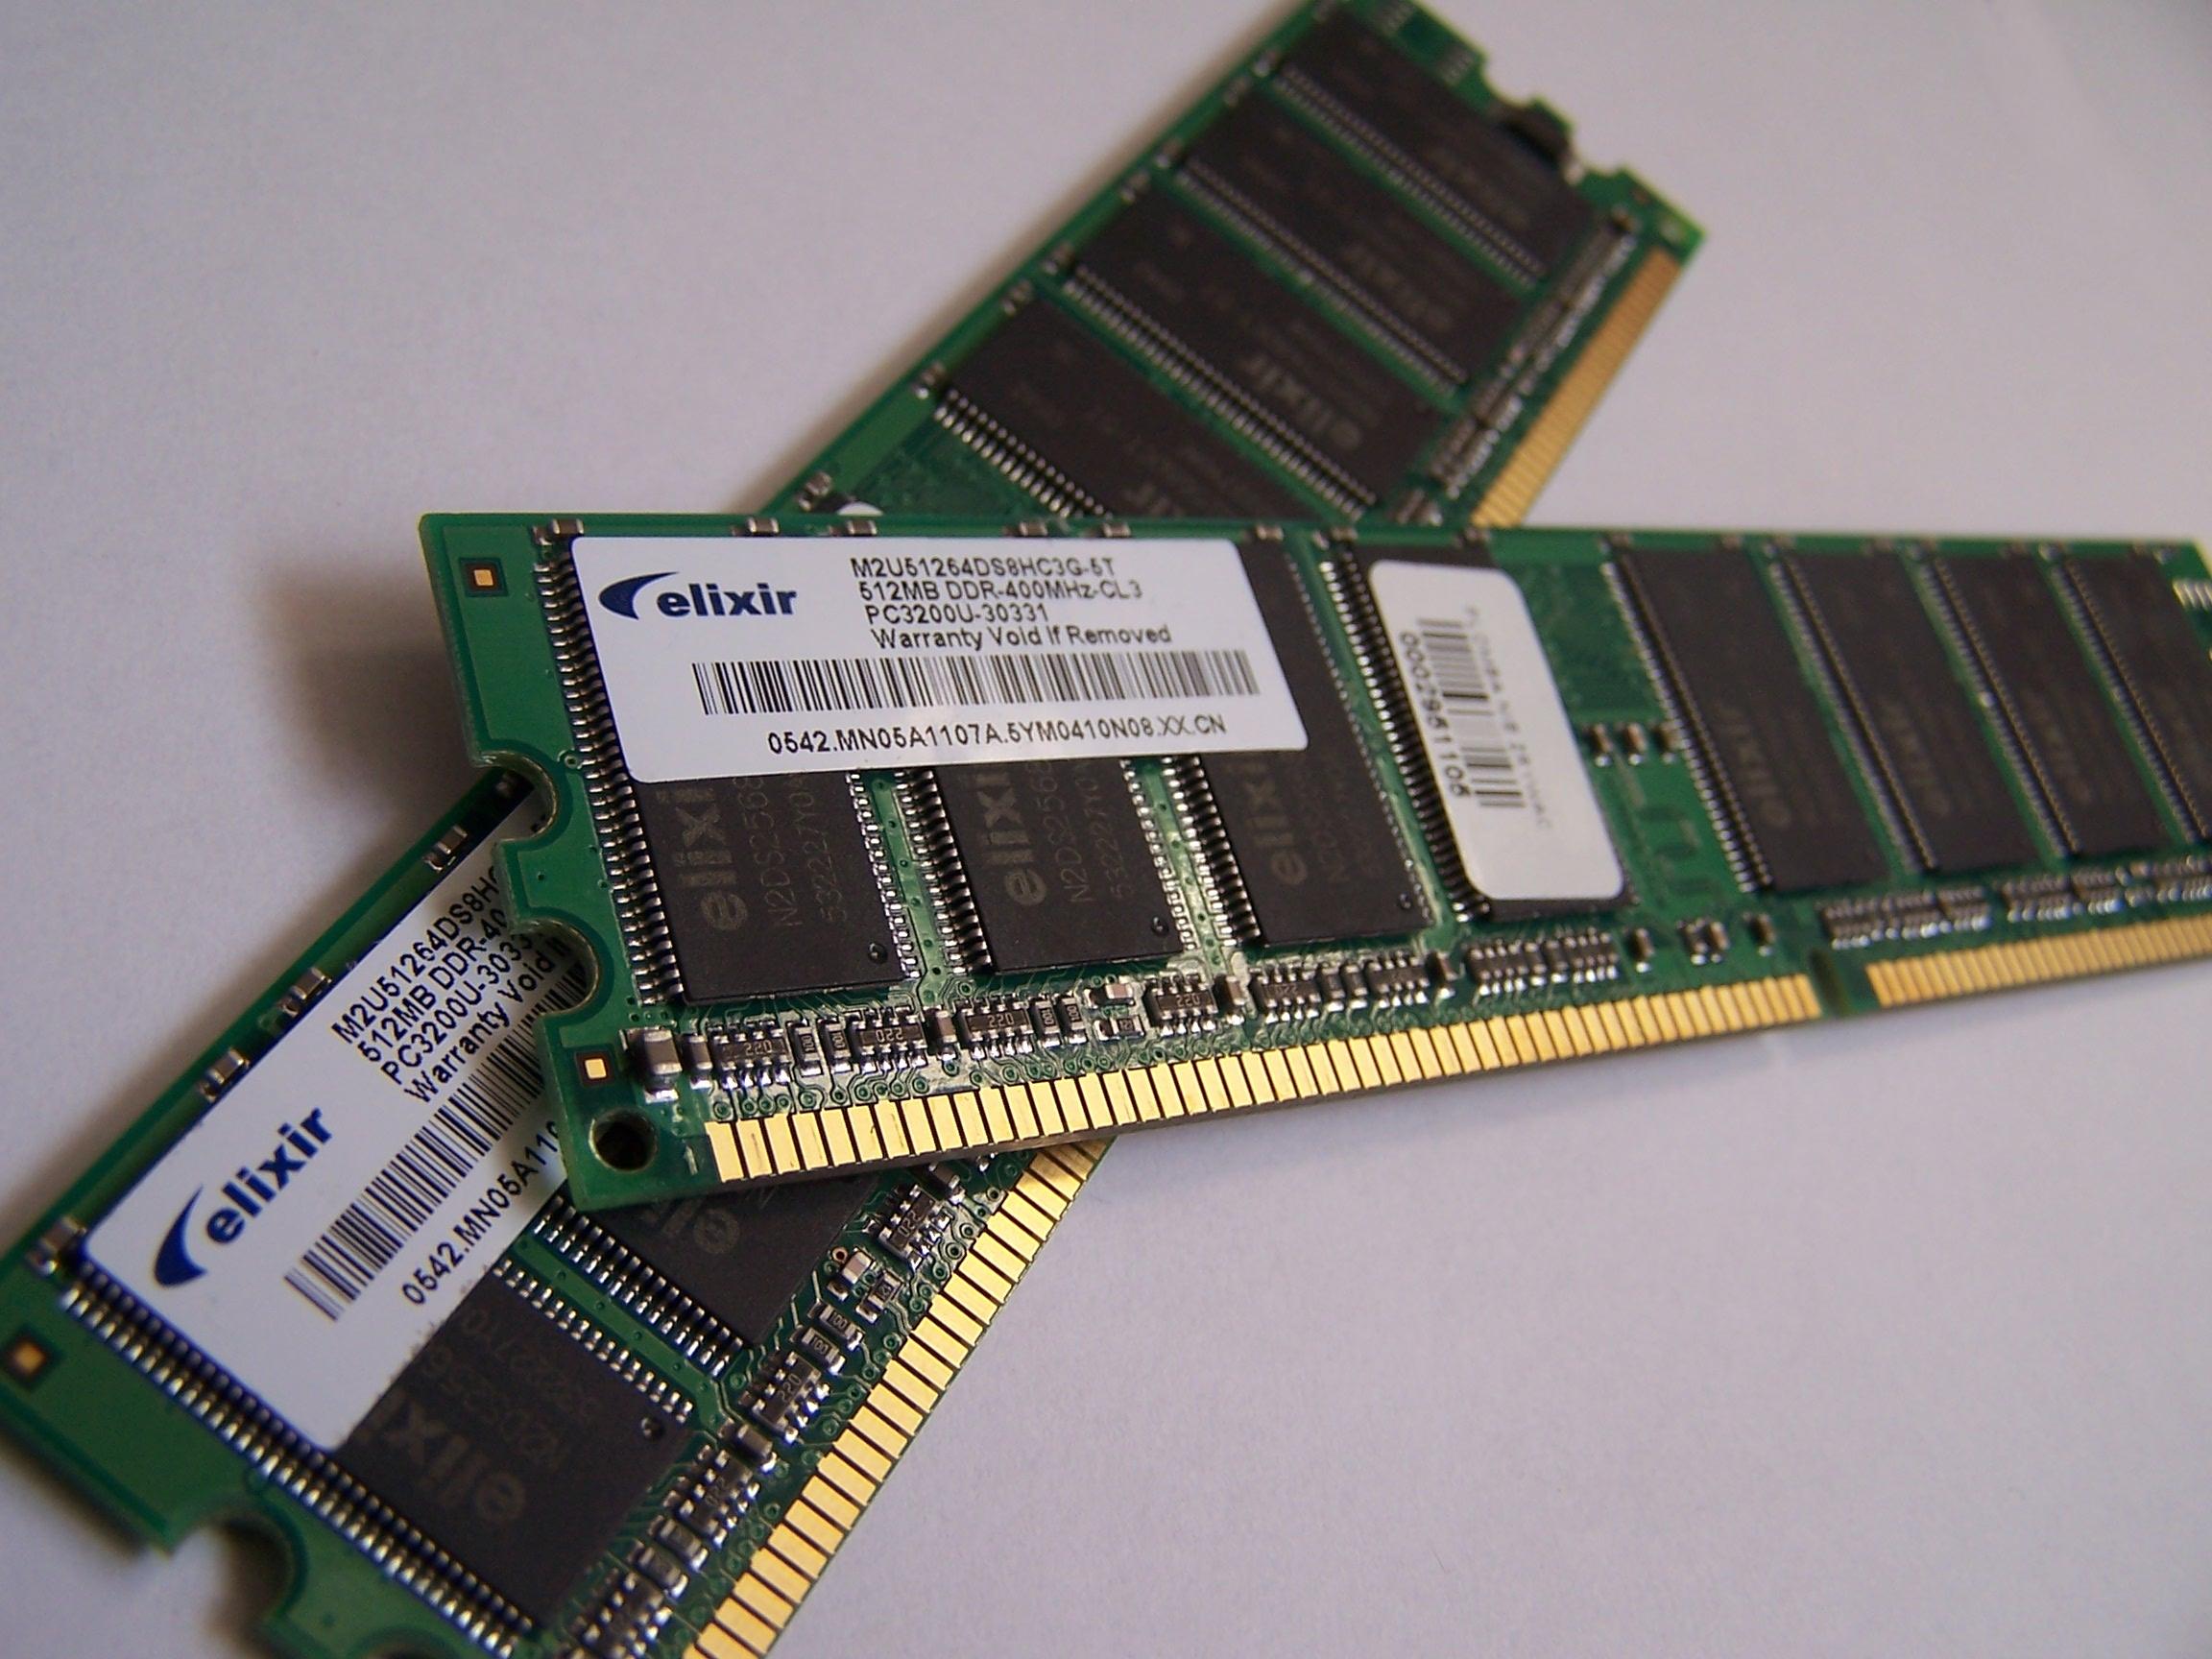 Memory_module_DDRAM_20-03-2006 (Foto: Memory_module_DDRAM_20-03-2006)